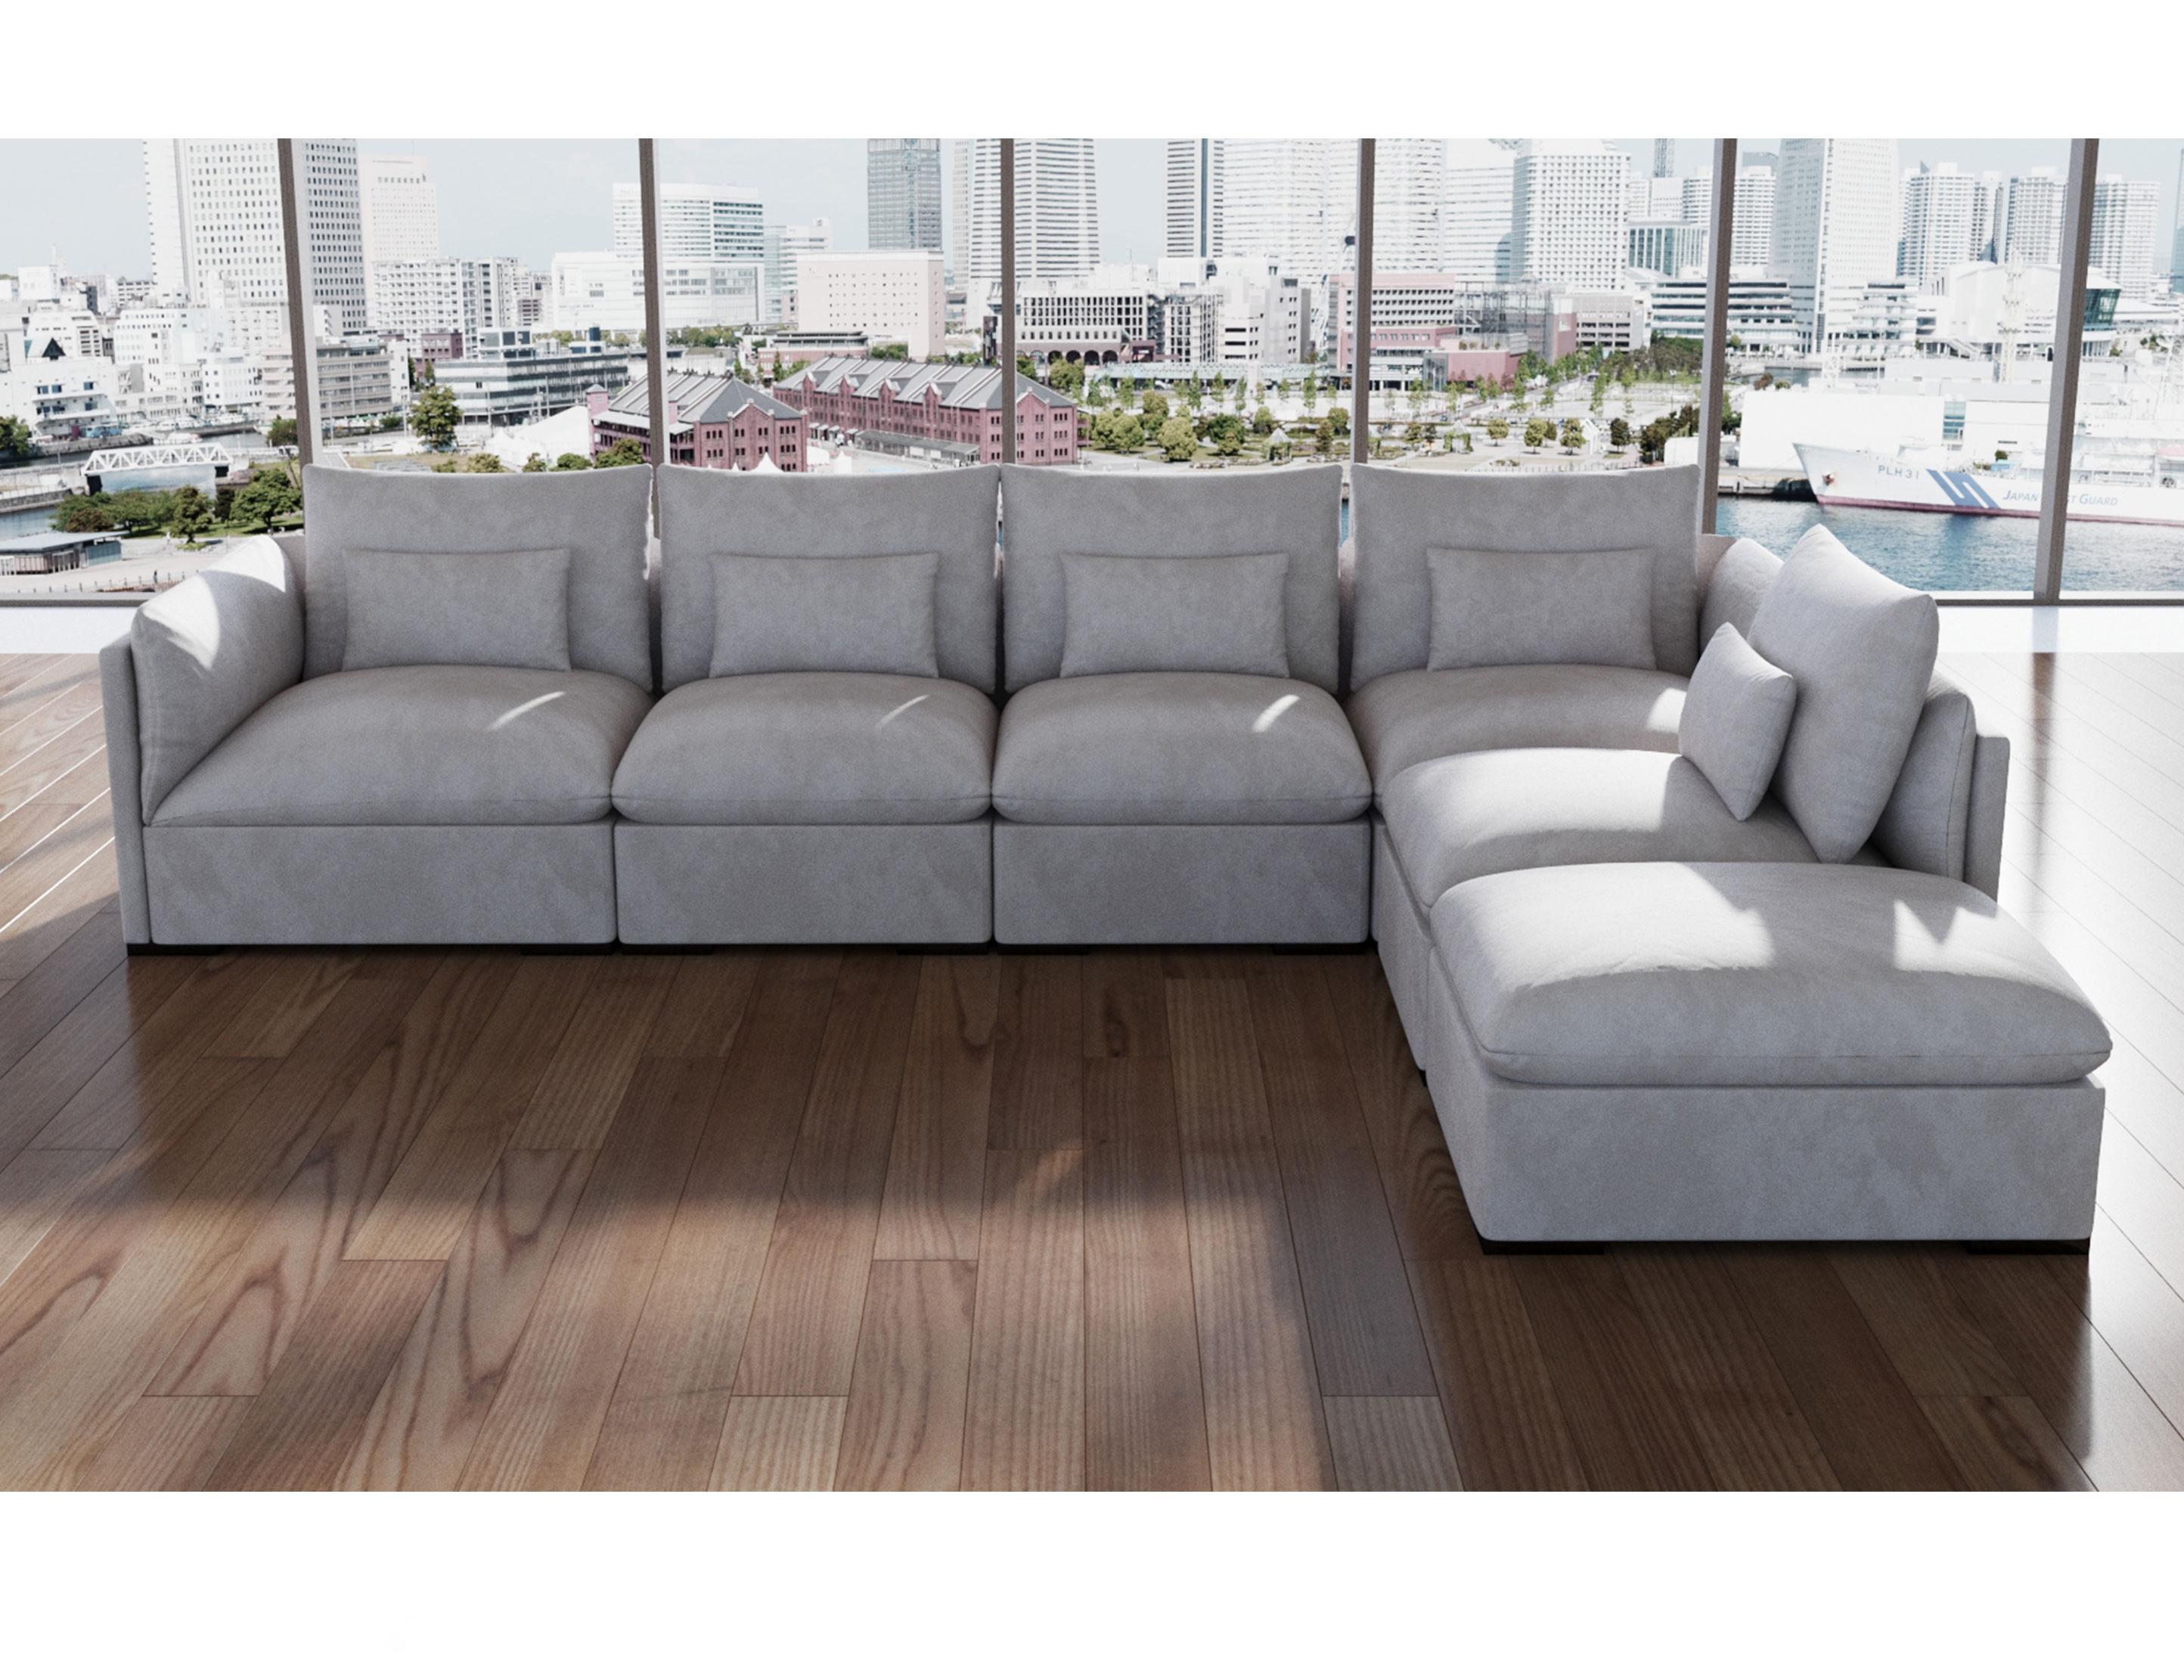 adagio luxury sectional modular sofa set of 4